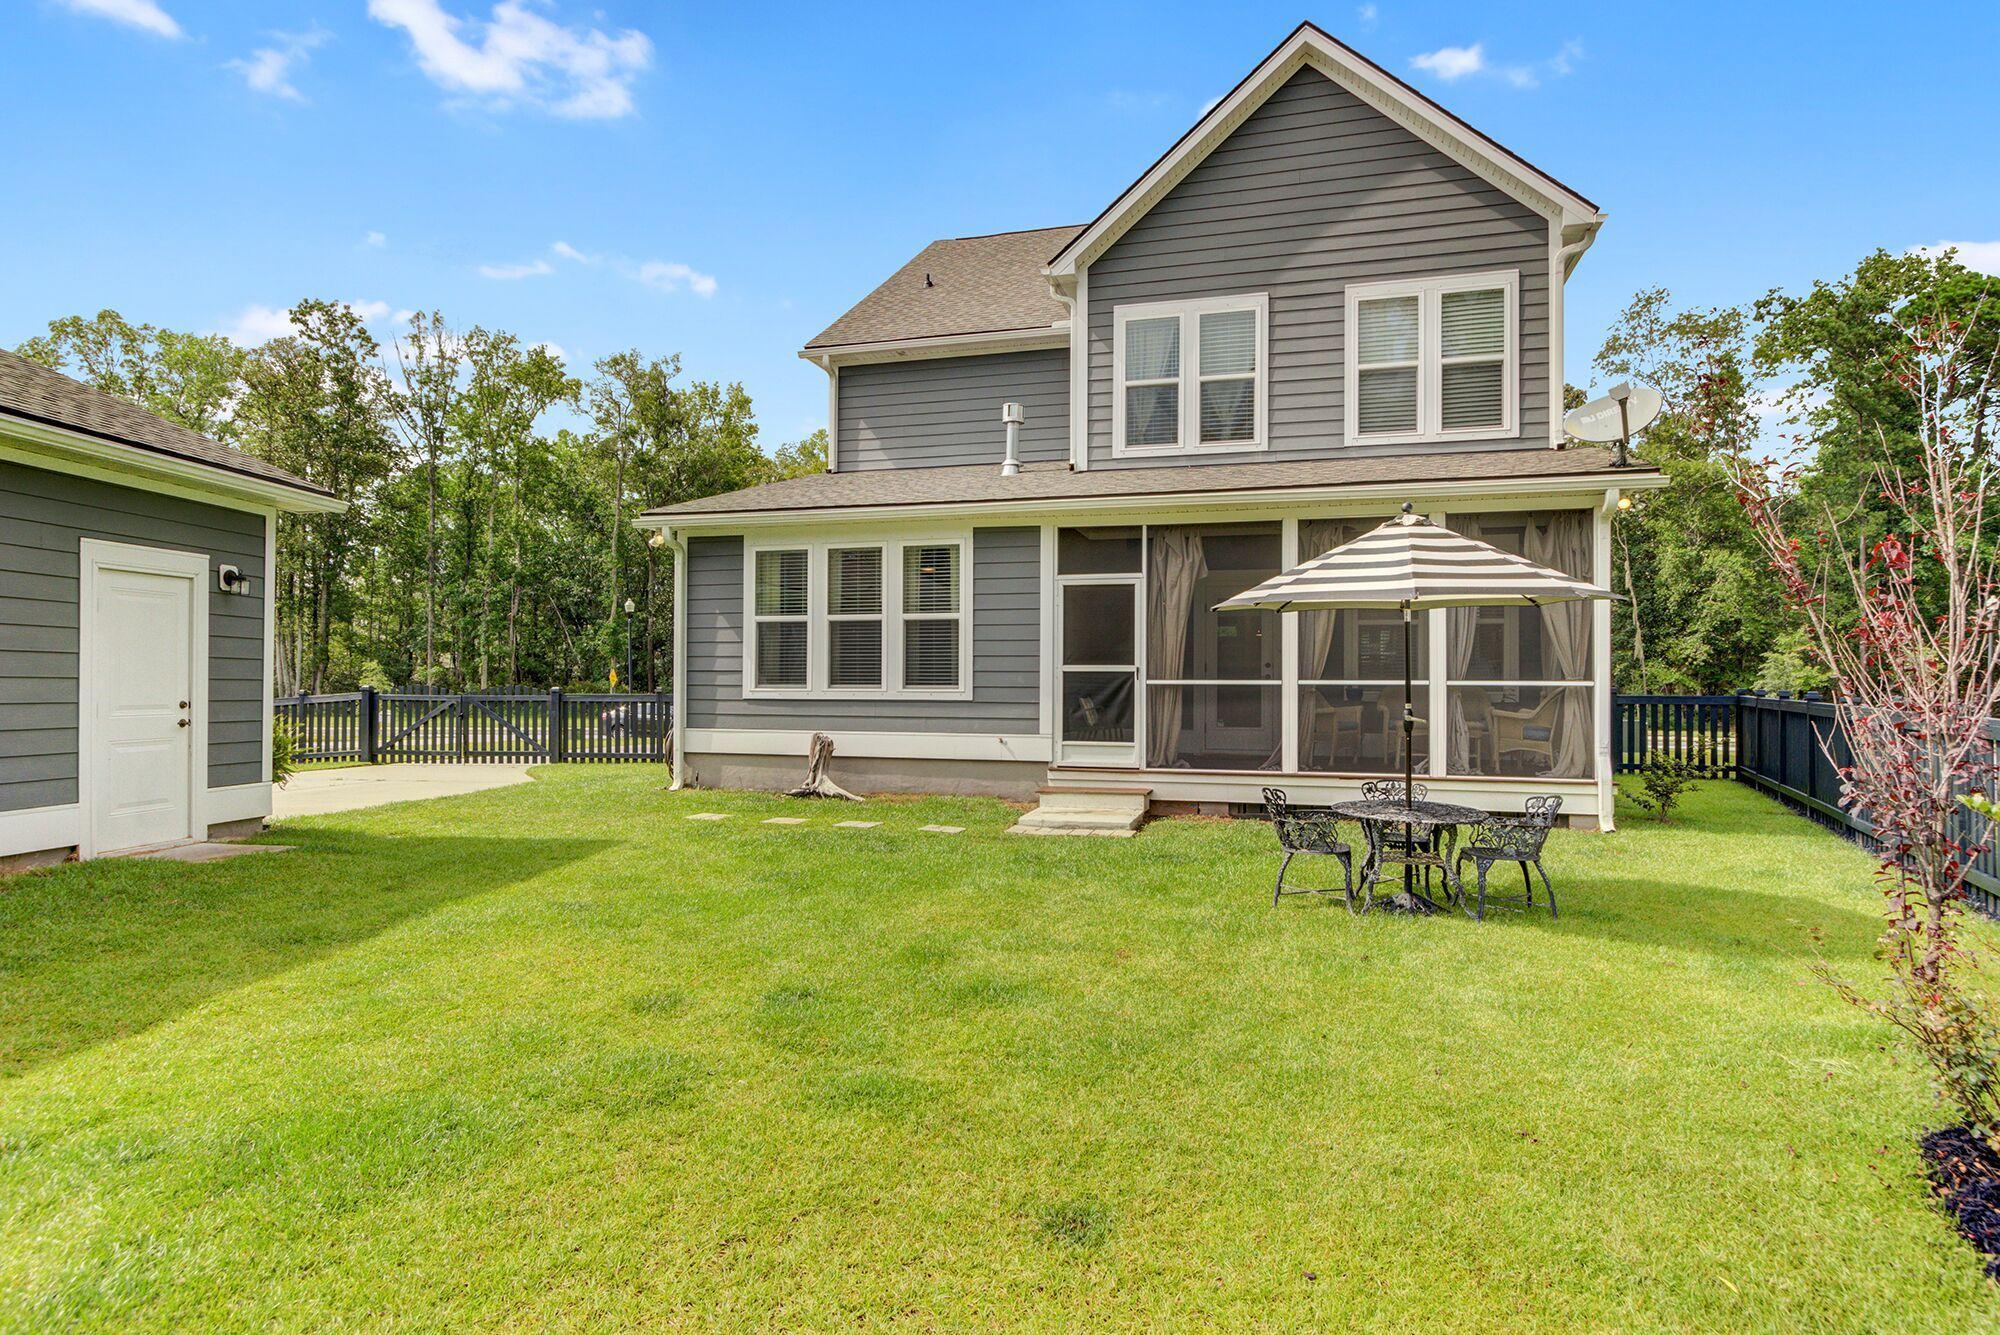 Carolina Bay Homes For Sale - 2739 Rutherford, Charleston, SC - 37